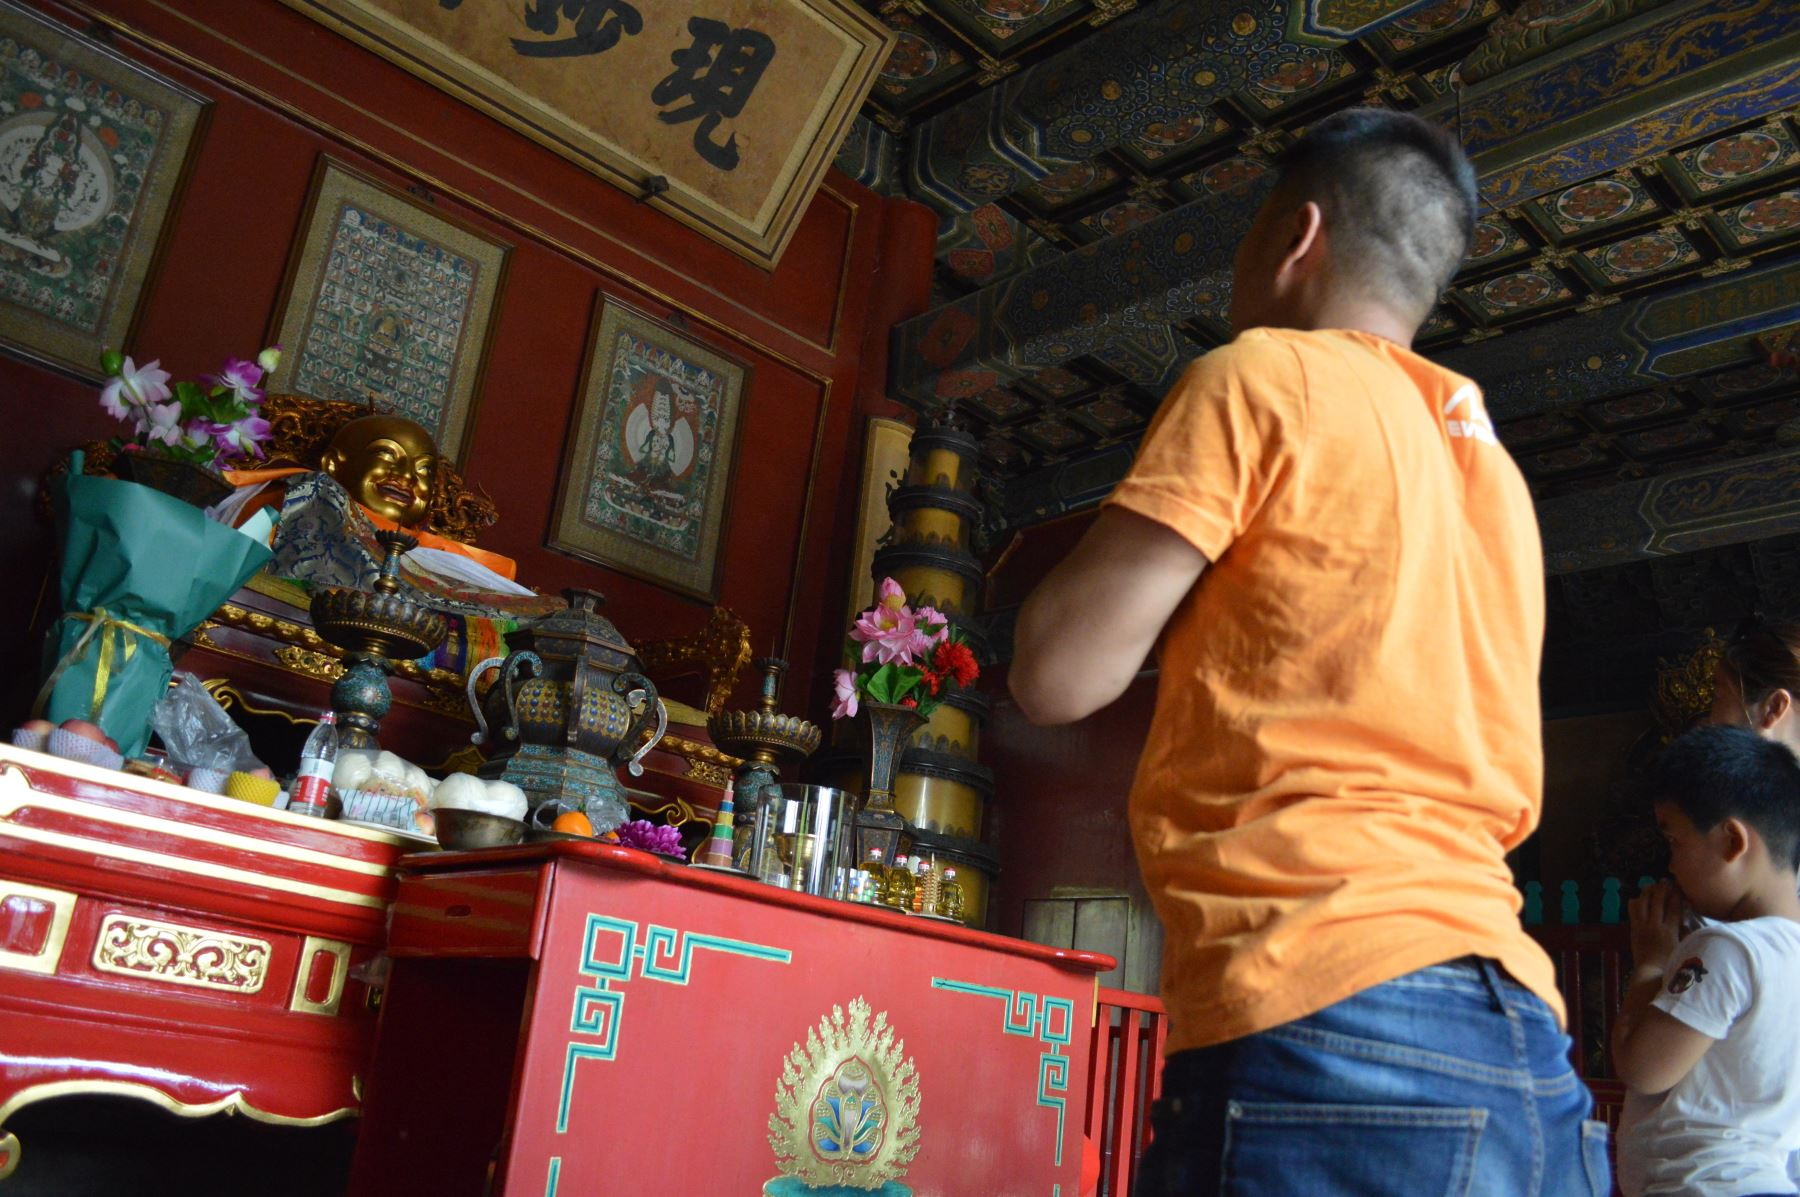 Templo de los Lamas en Beijing, China. Foto: ANDINA/Víctor Véliz